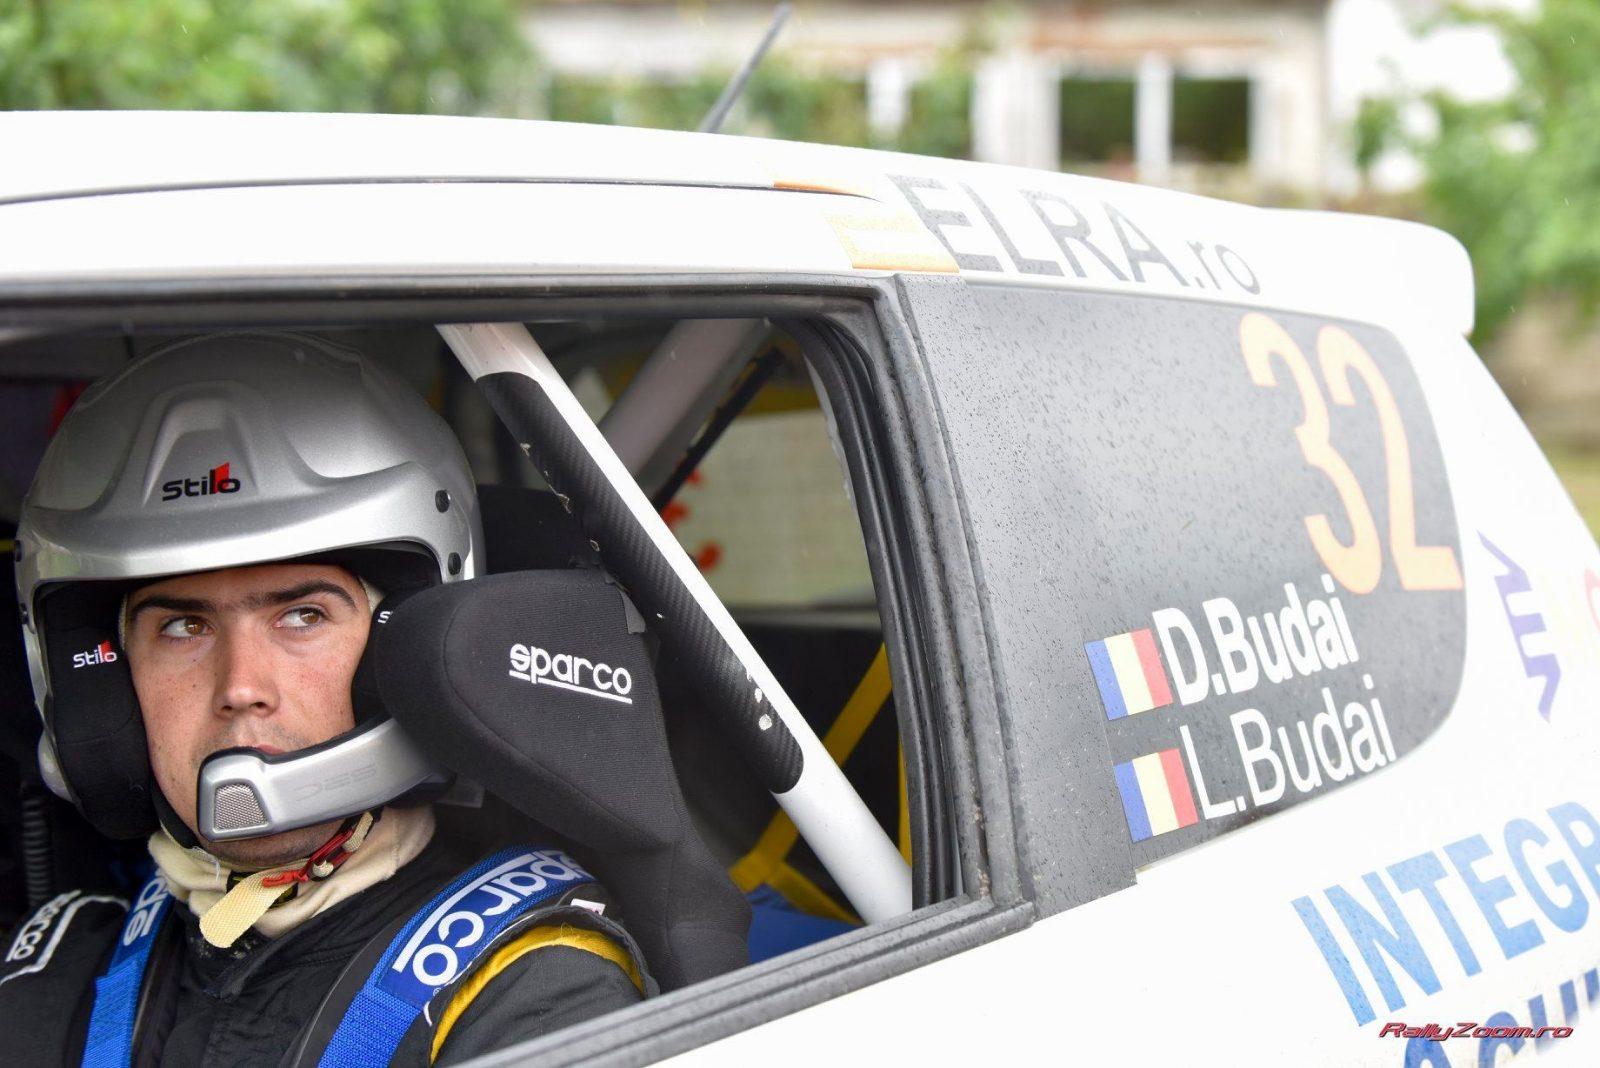 Dănuț Budai este lider la Cupa Suzuki. Sursă foto: rallyzoom